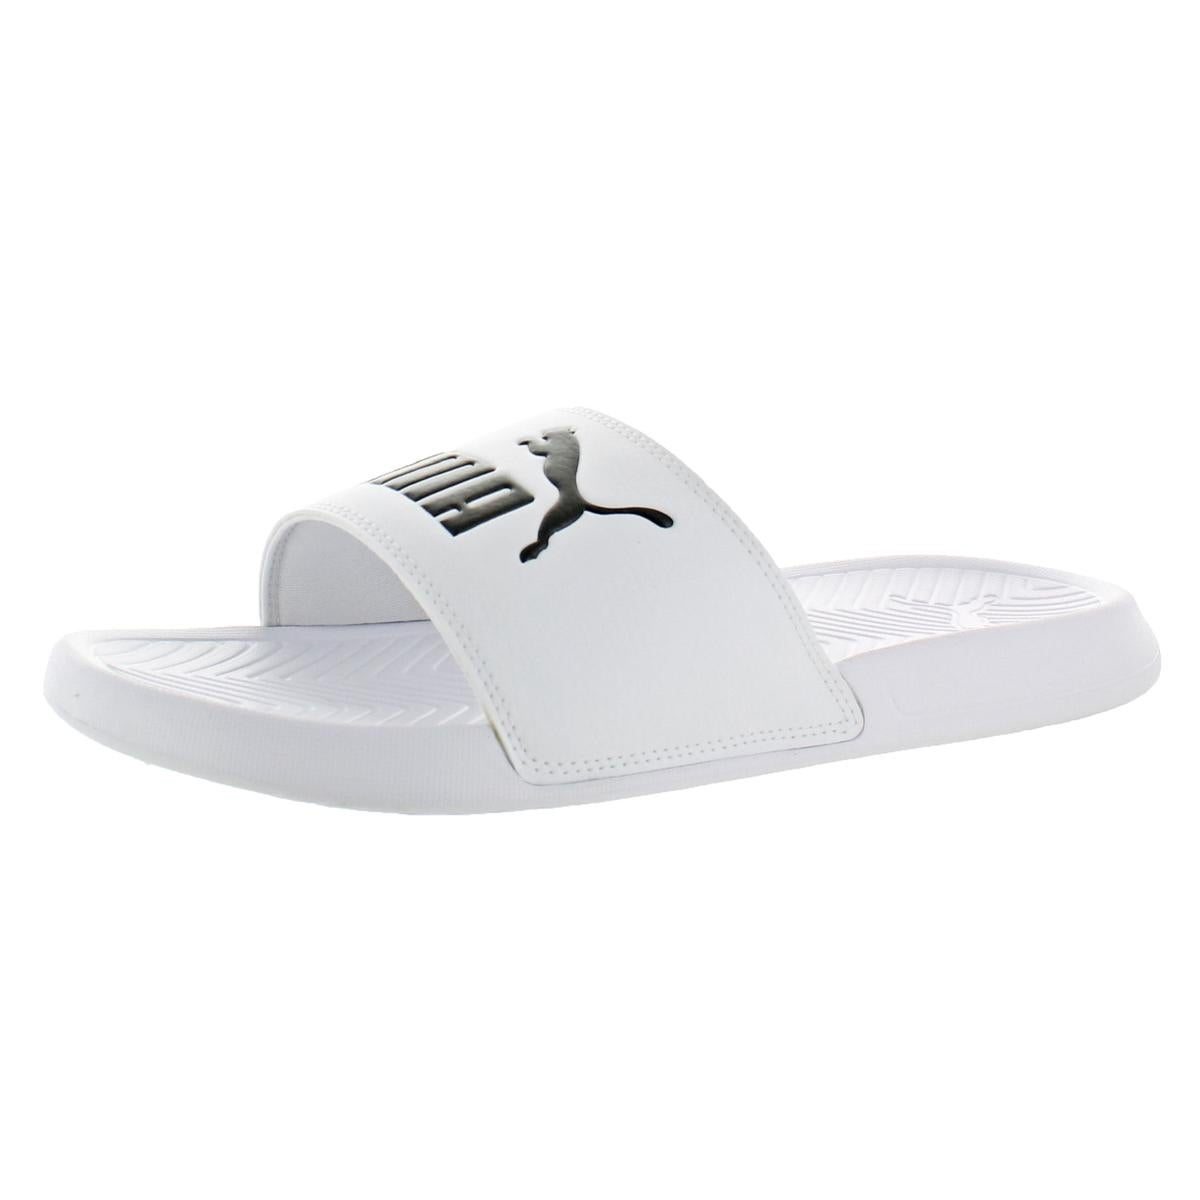 5c0fbc6604c63 Shop Puma Mens Popcat Slide Sandals Lightweight Pool Slide - Free Shipping  On Orders Over  45 - Overstock - 22320581